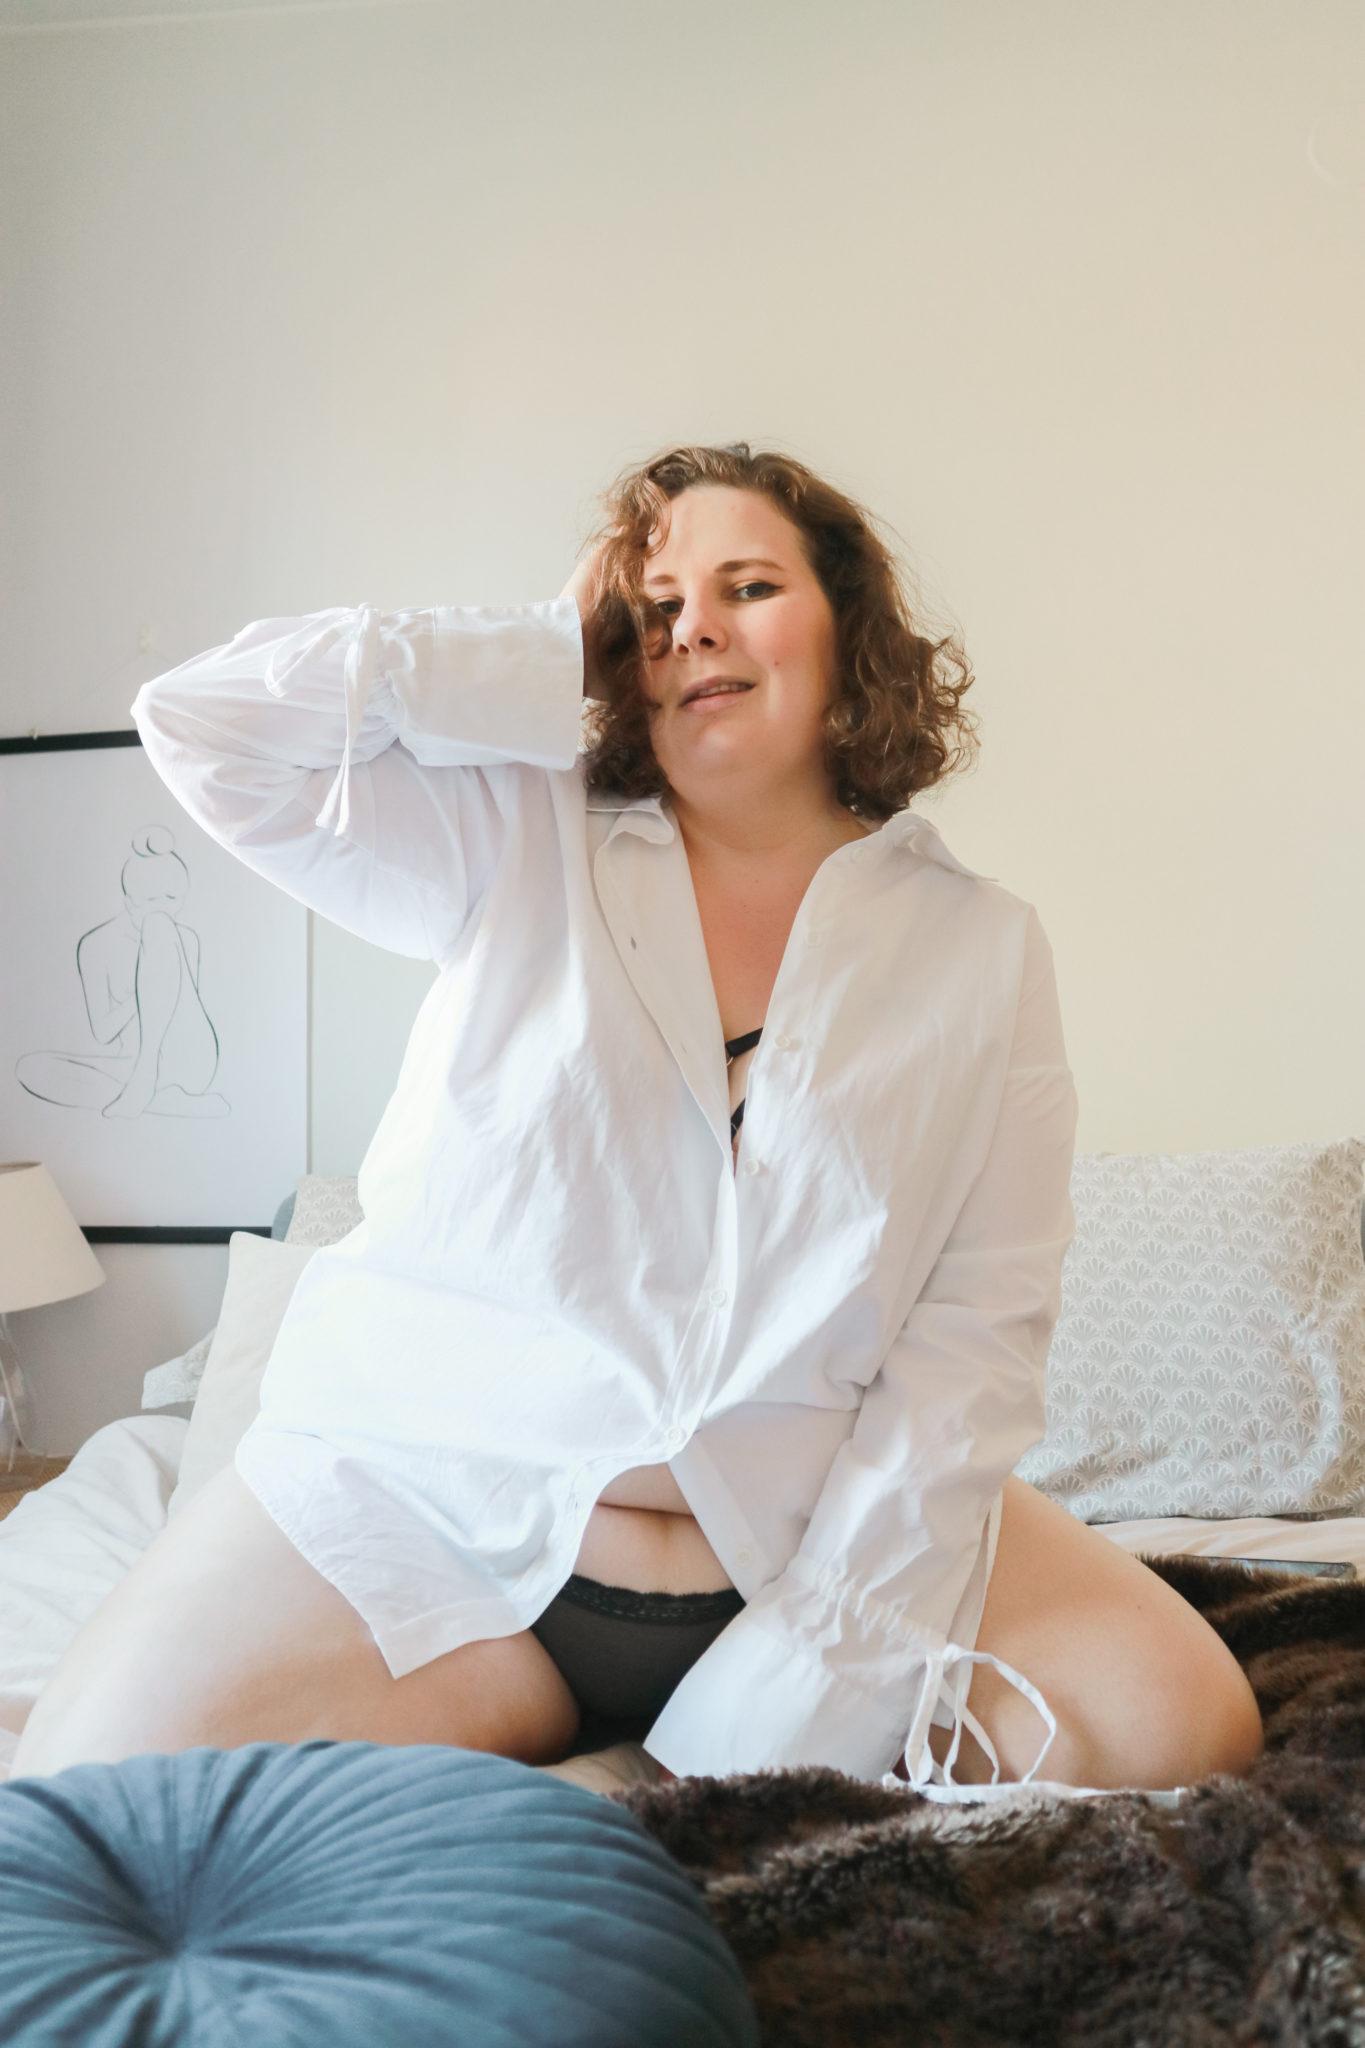 Penetraatiokeskeisyys - BMH - Big mamas home by Jenni